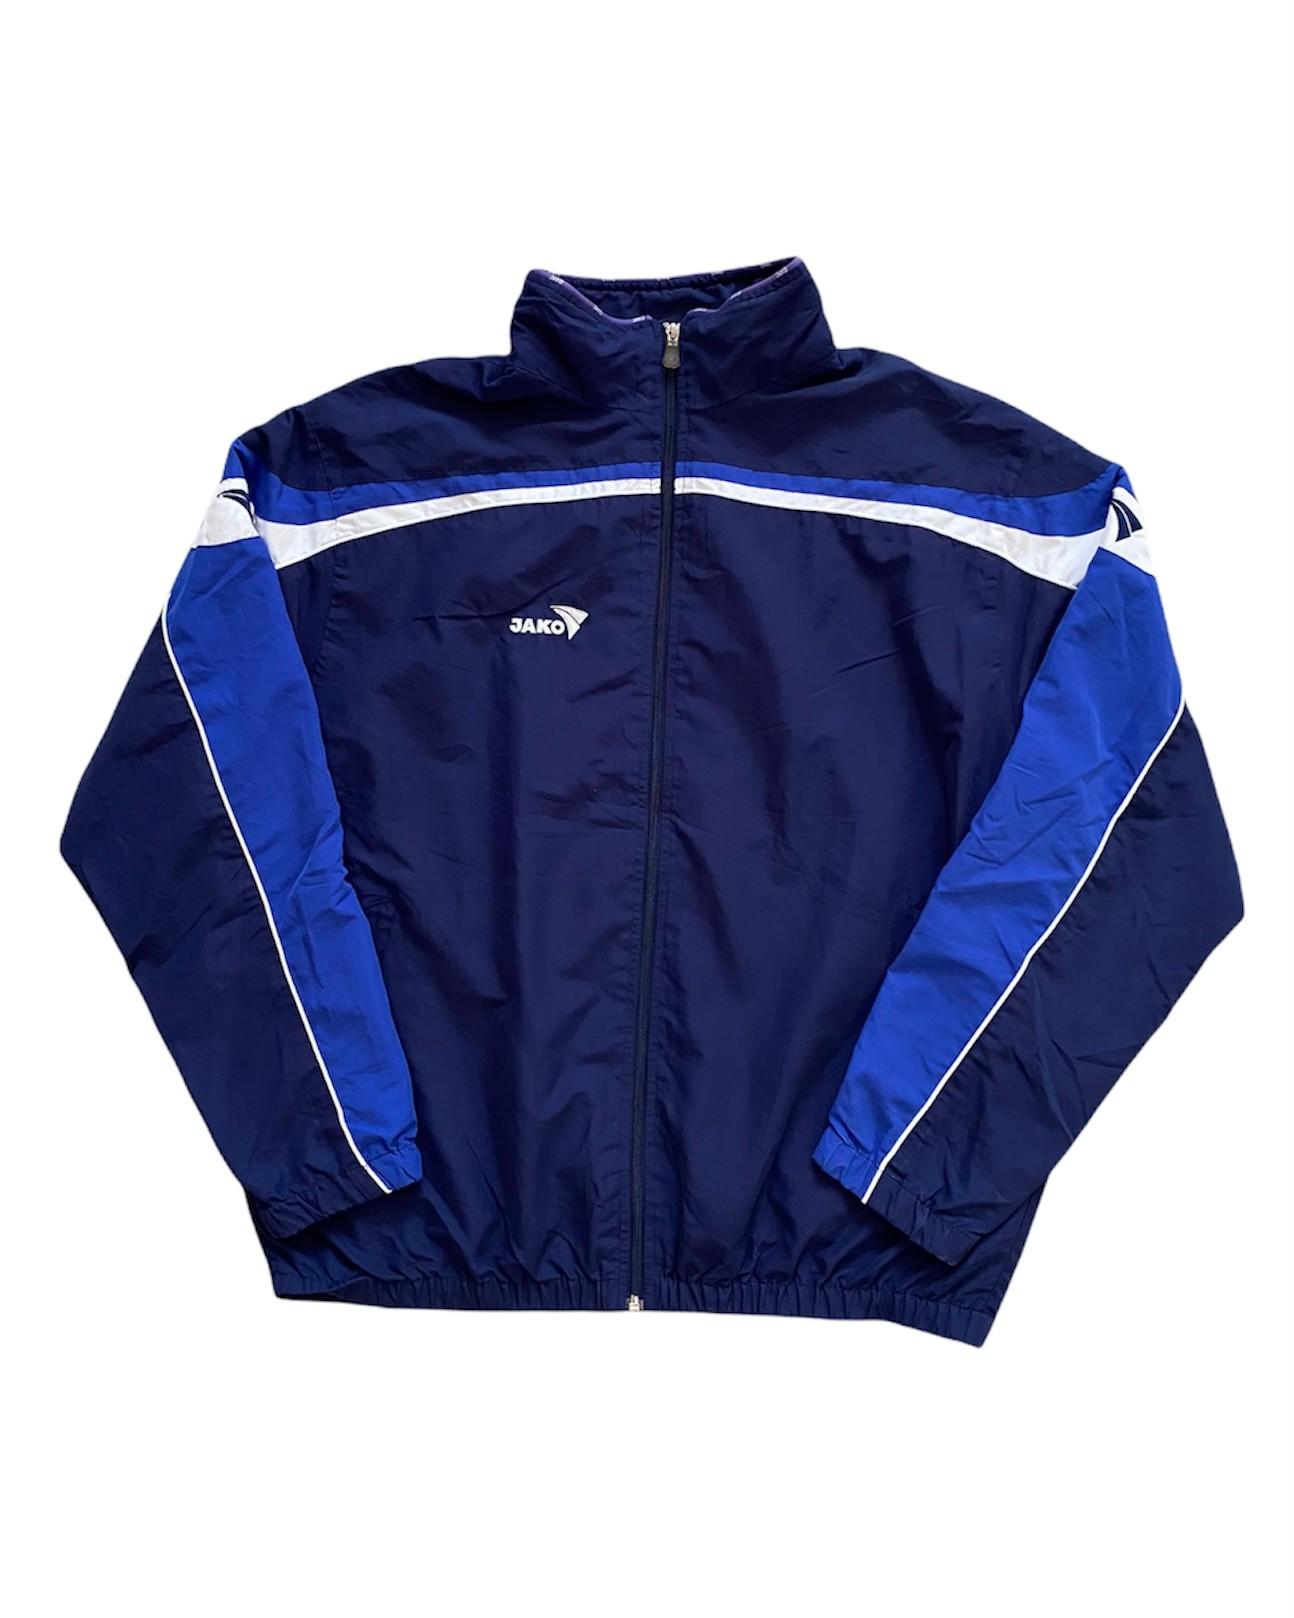 Jako Blue Vintage Mevsimlik Ceket (XL)